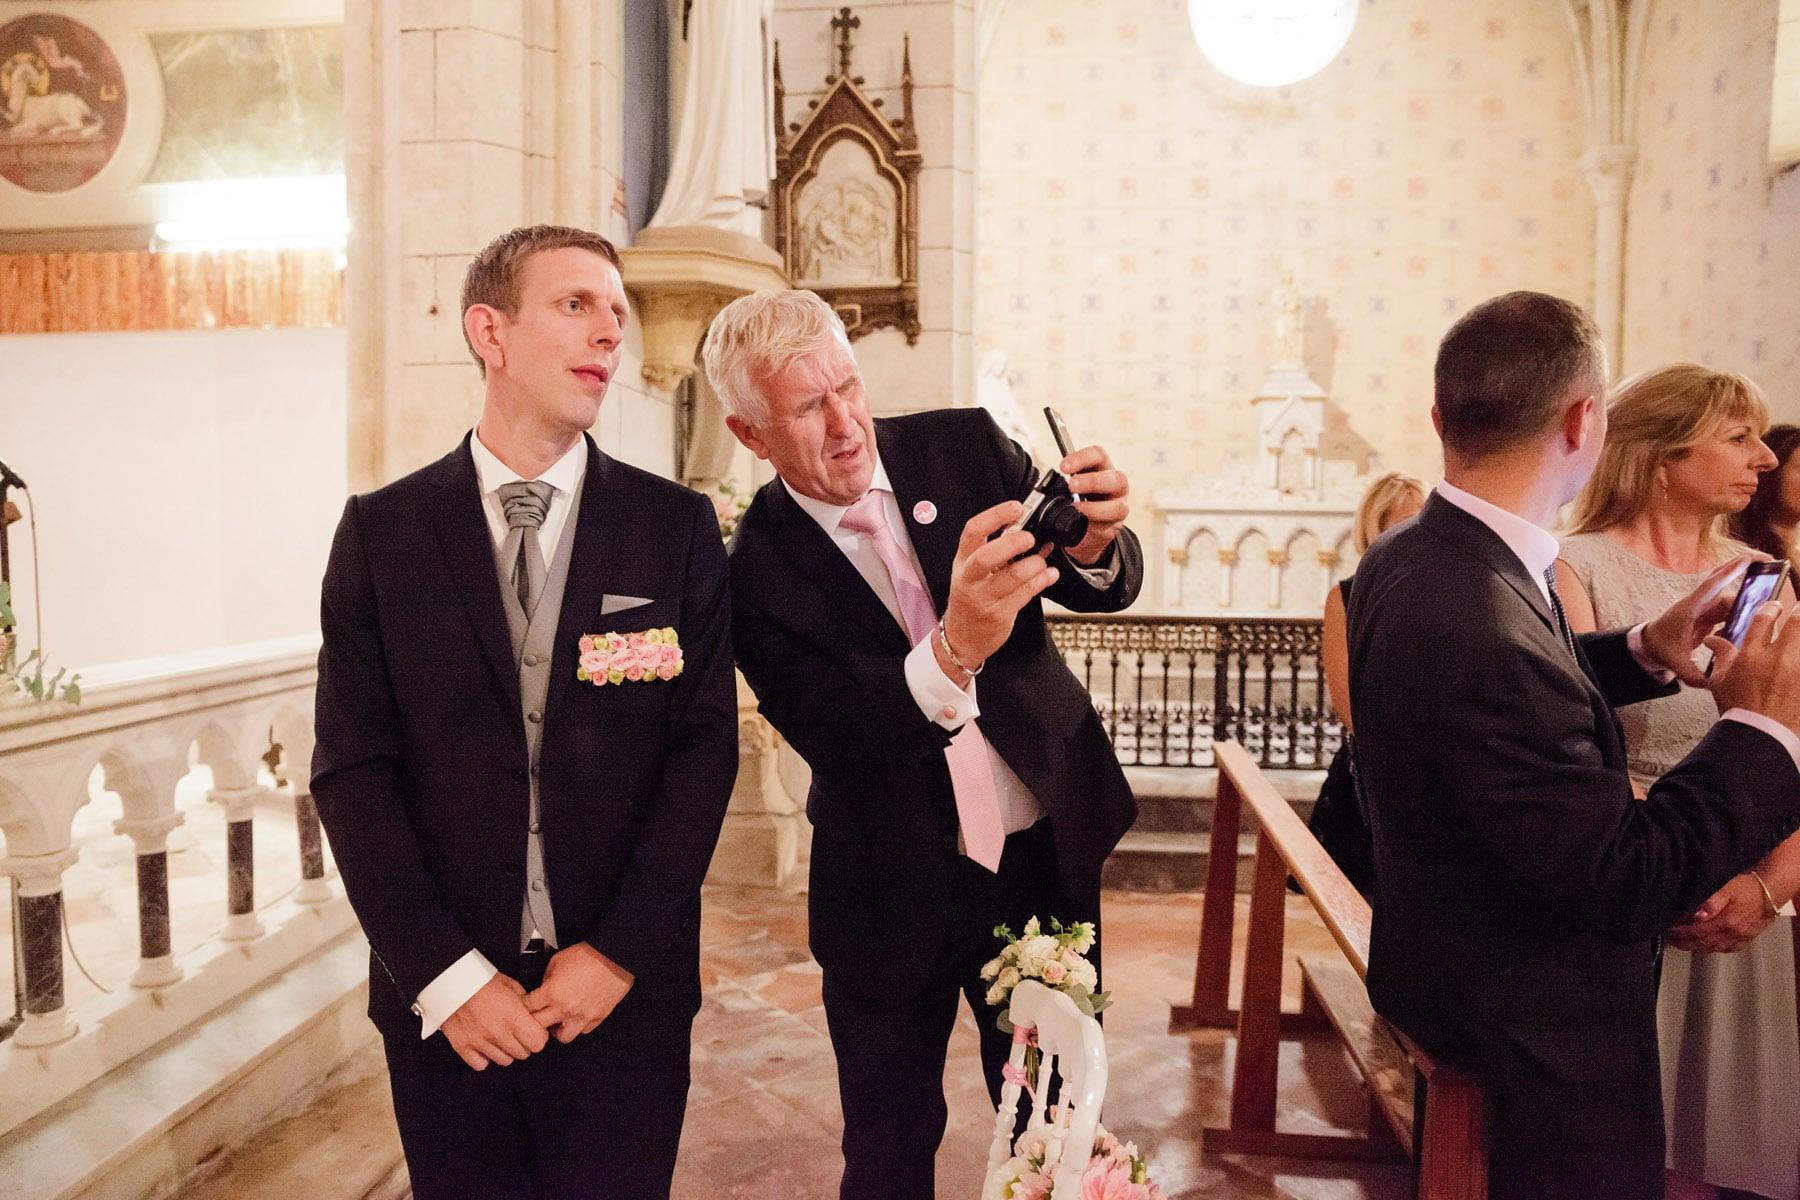 photographe mariage bordeaux landes fineart francais sarah miramon blog 12